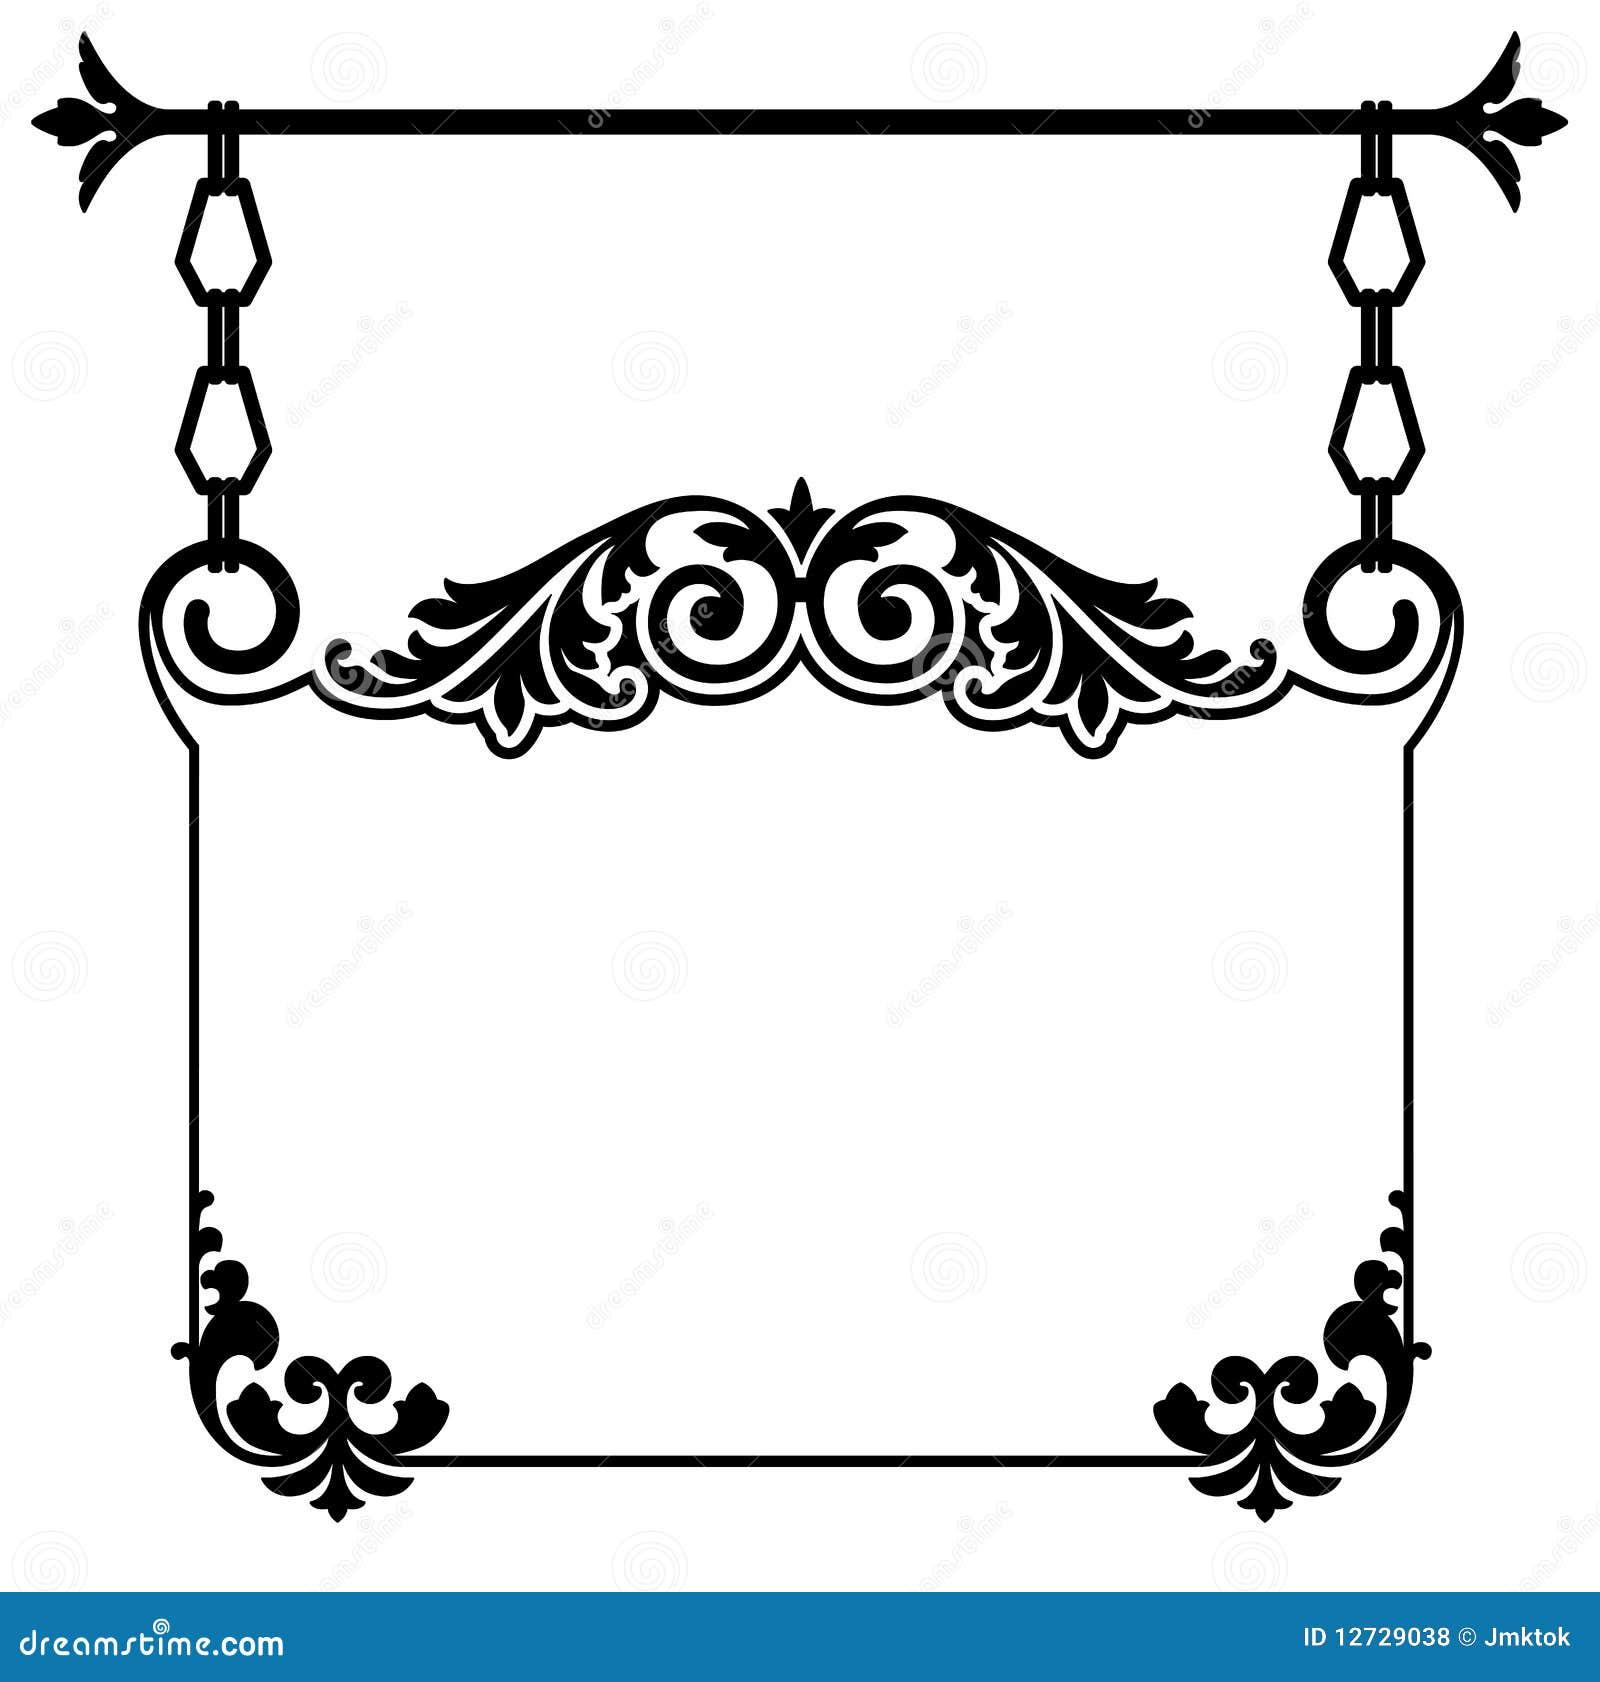 Vintage Hanging Sign Royalty Free Stock Photos Image